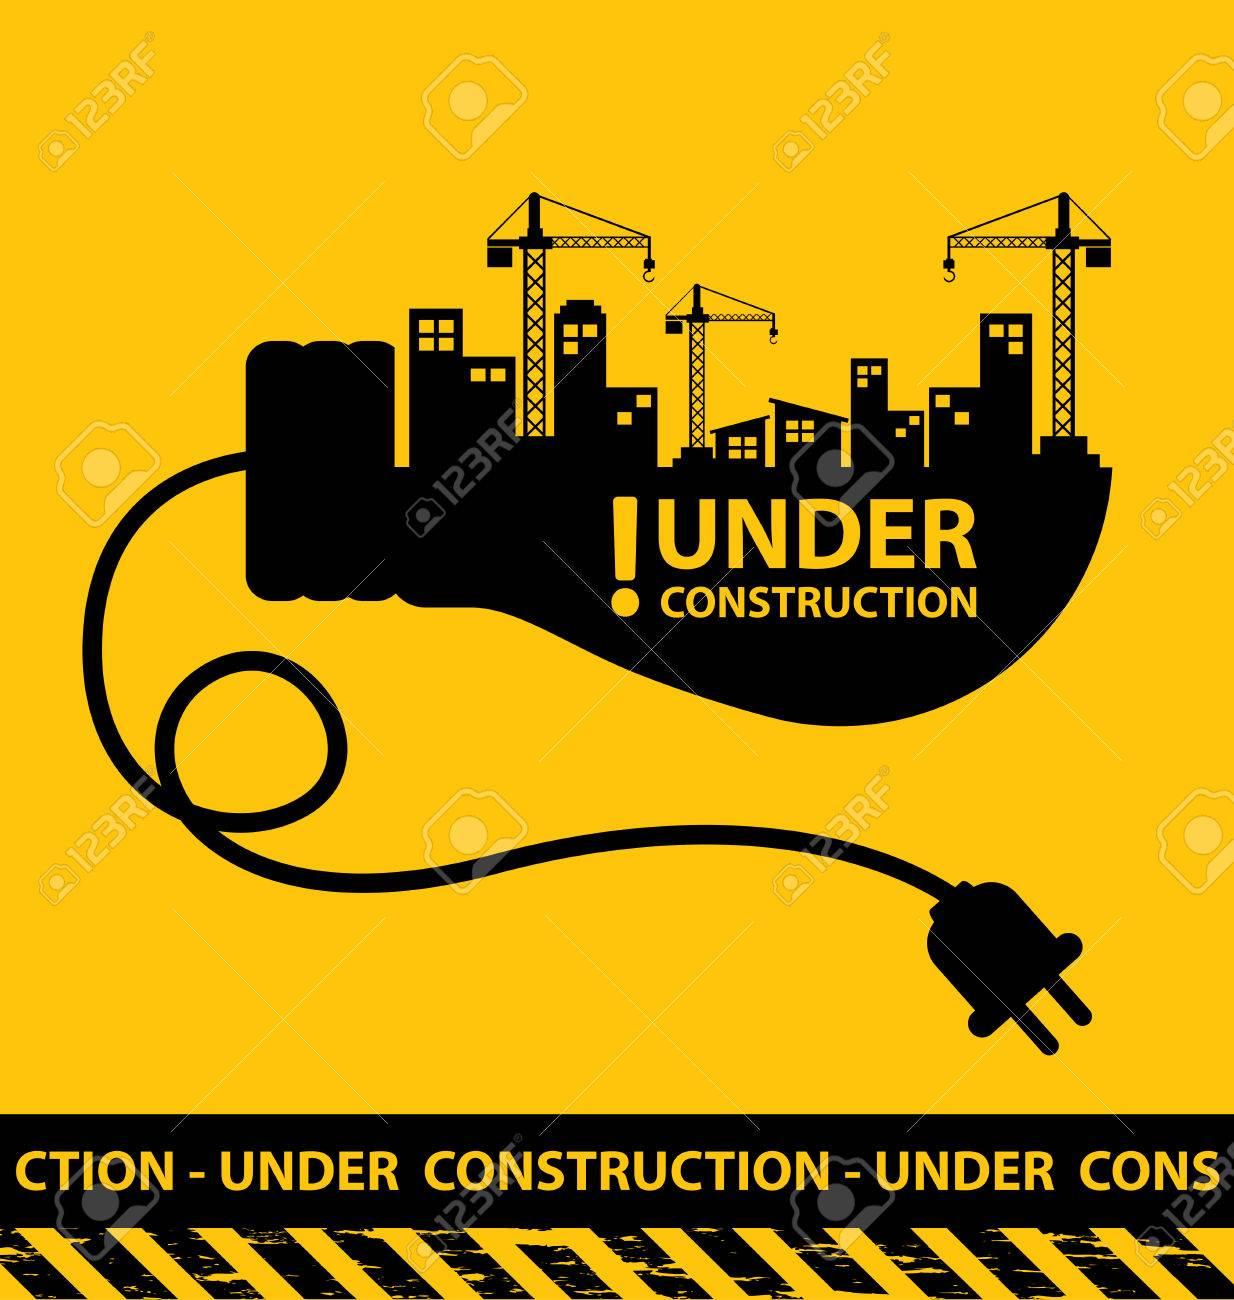 under construction background vector illustration - 45878065